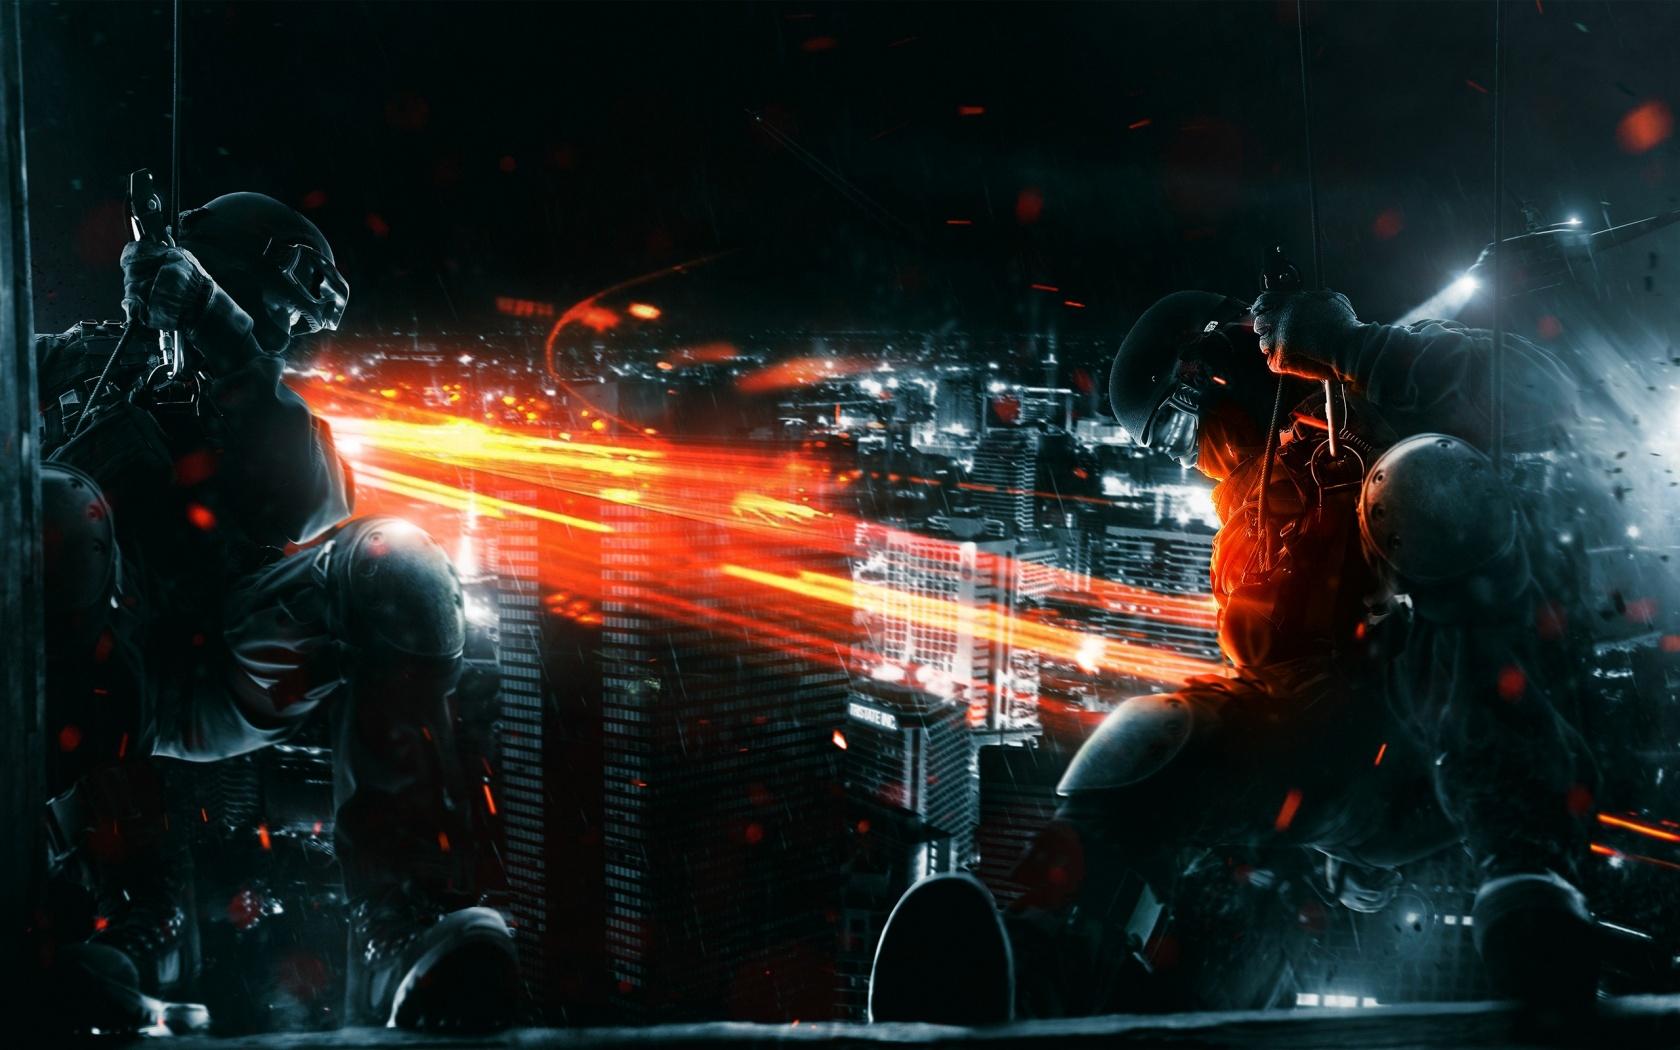 Battlefield 3 spec ops